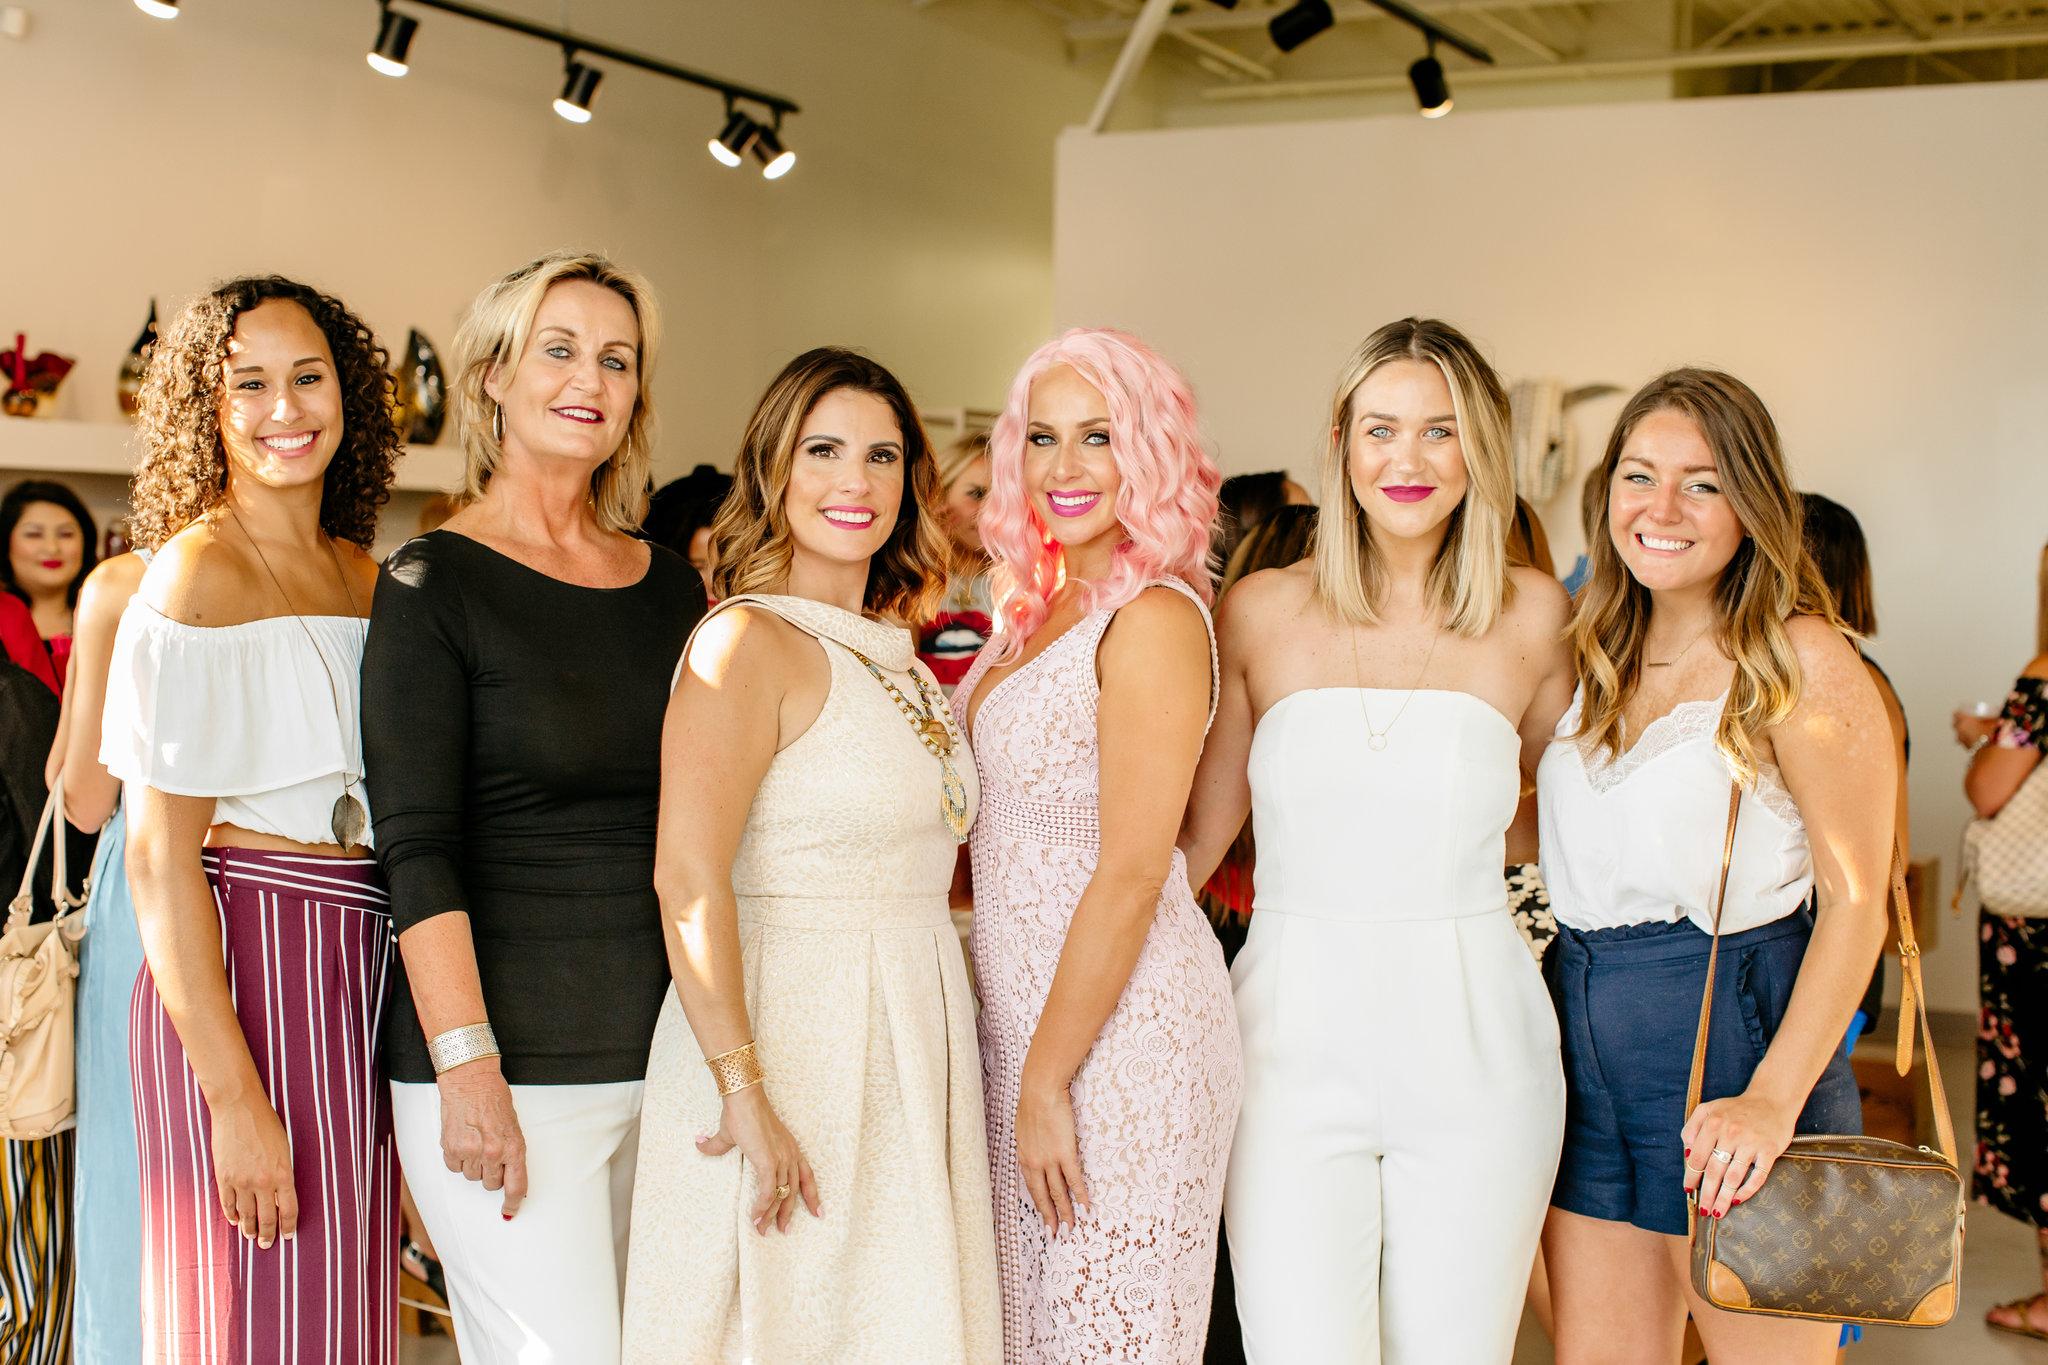 Alexa-Vossler-Photo_Dallas-Event-Photographer_Brite-Bar-Beauty-2018-Lipstick-Launch-Party-141.jpg